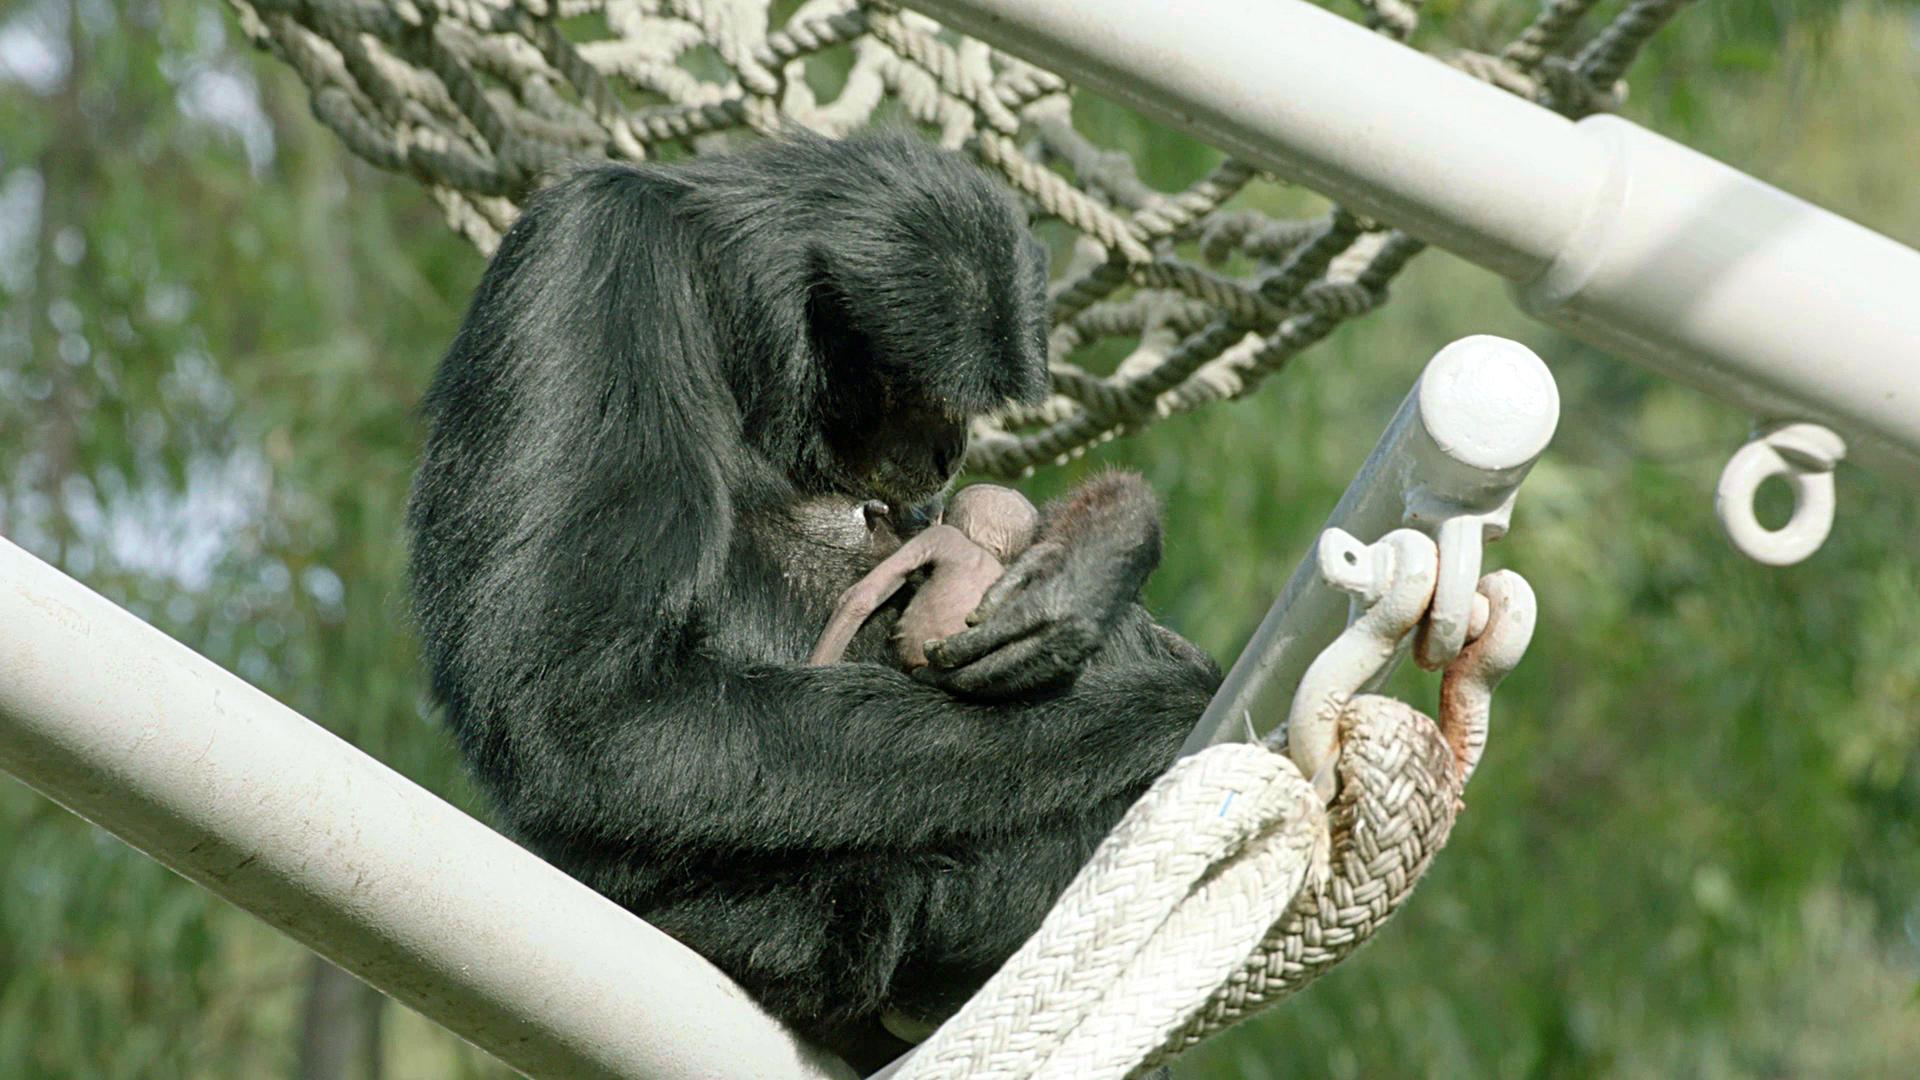 Defying birth control, siamang Eloise has baby at San Diego Zoo - The San  Diego Union-Tribune